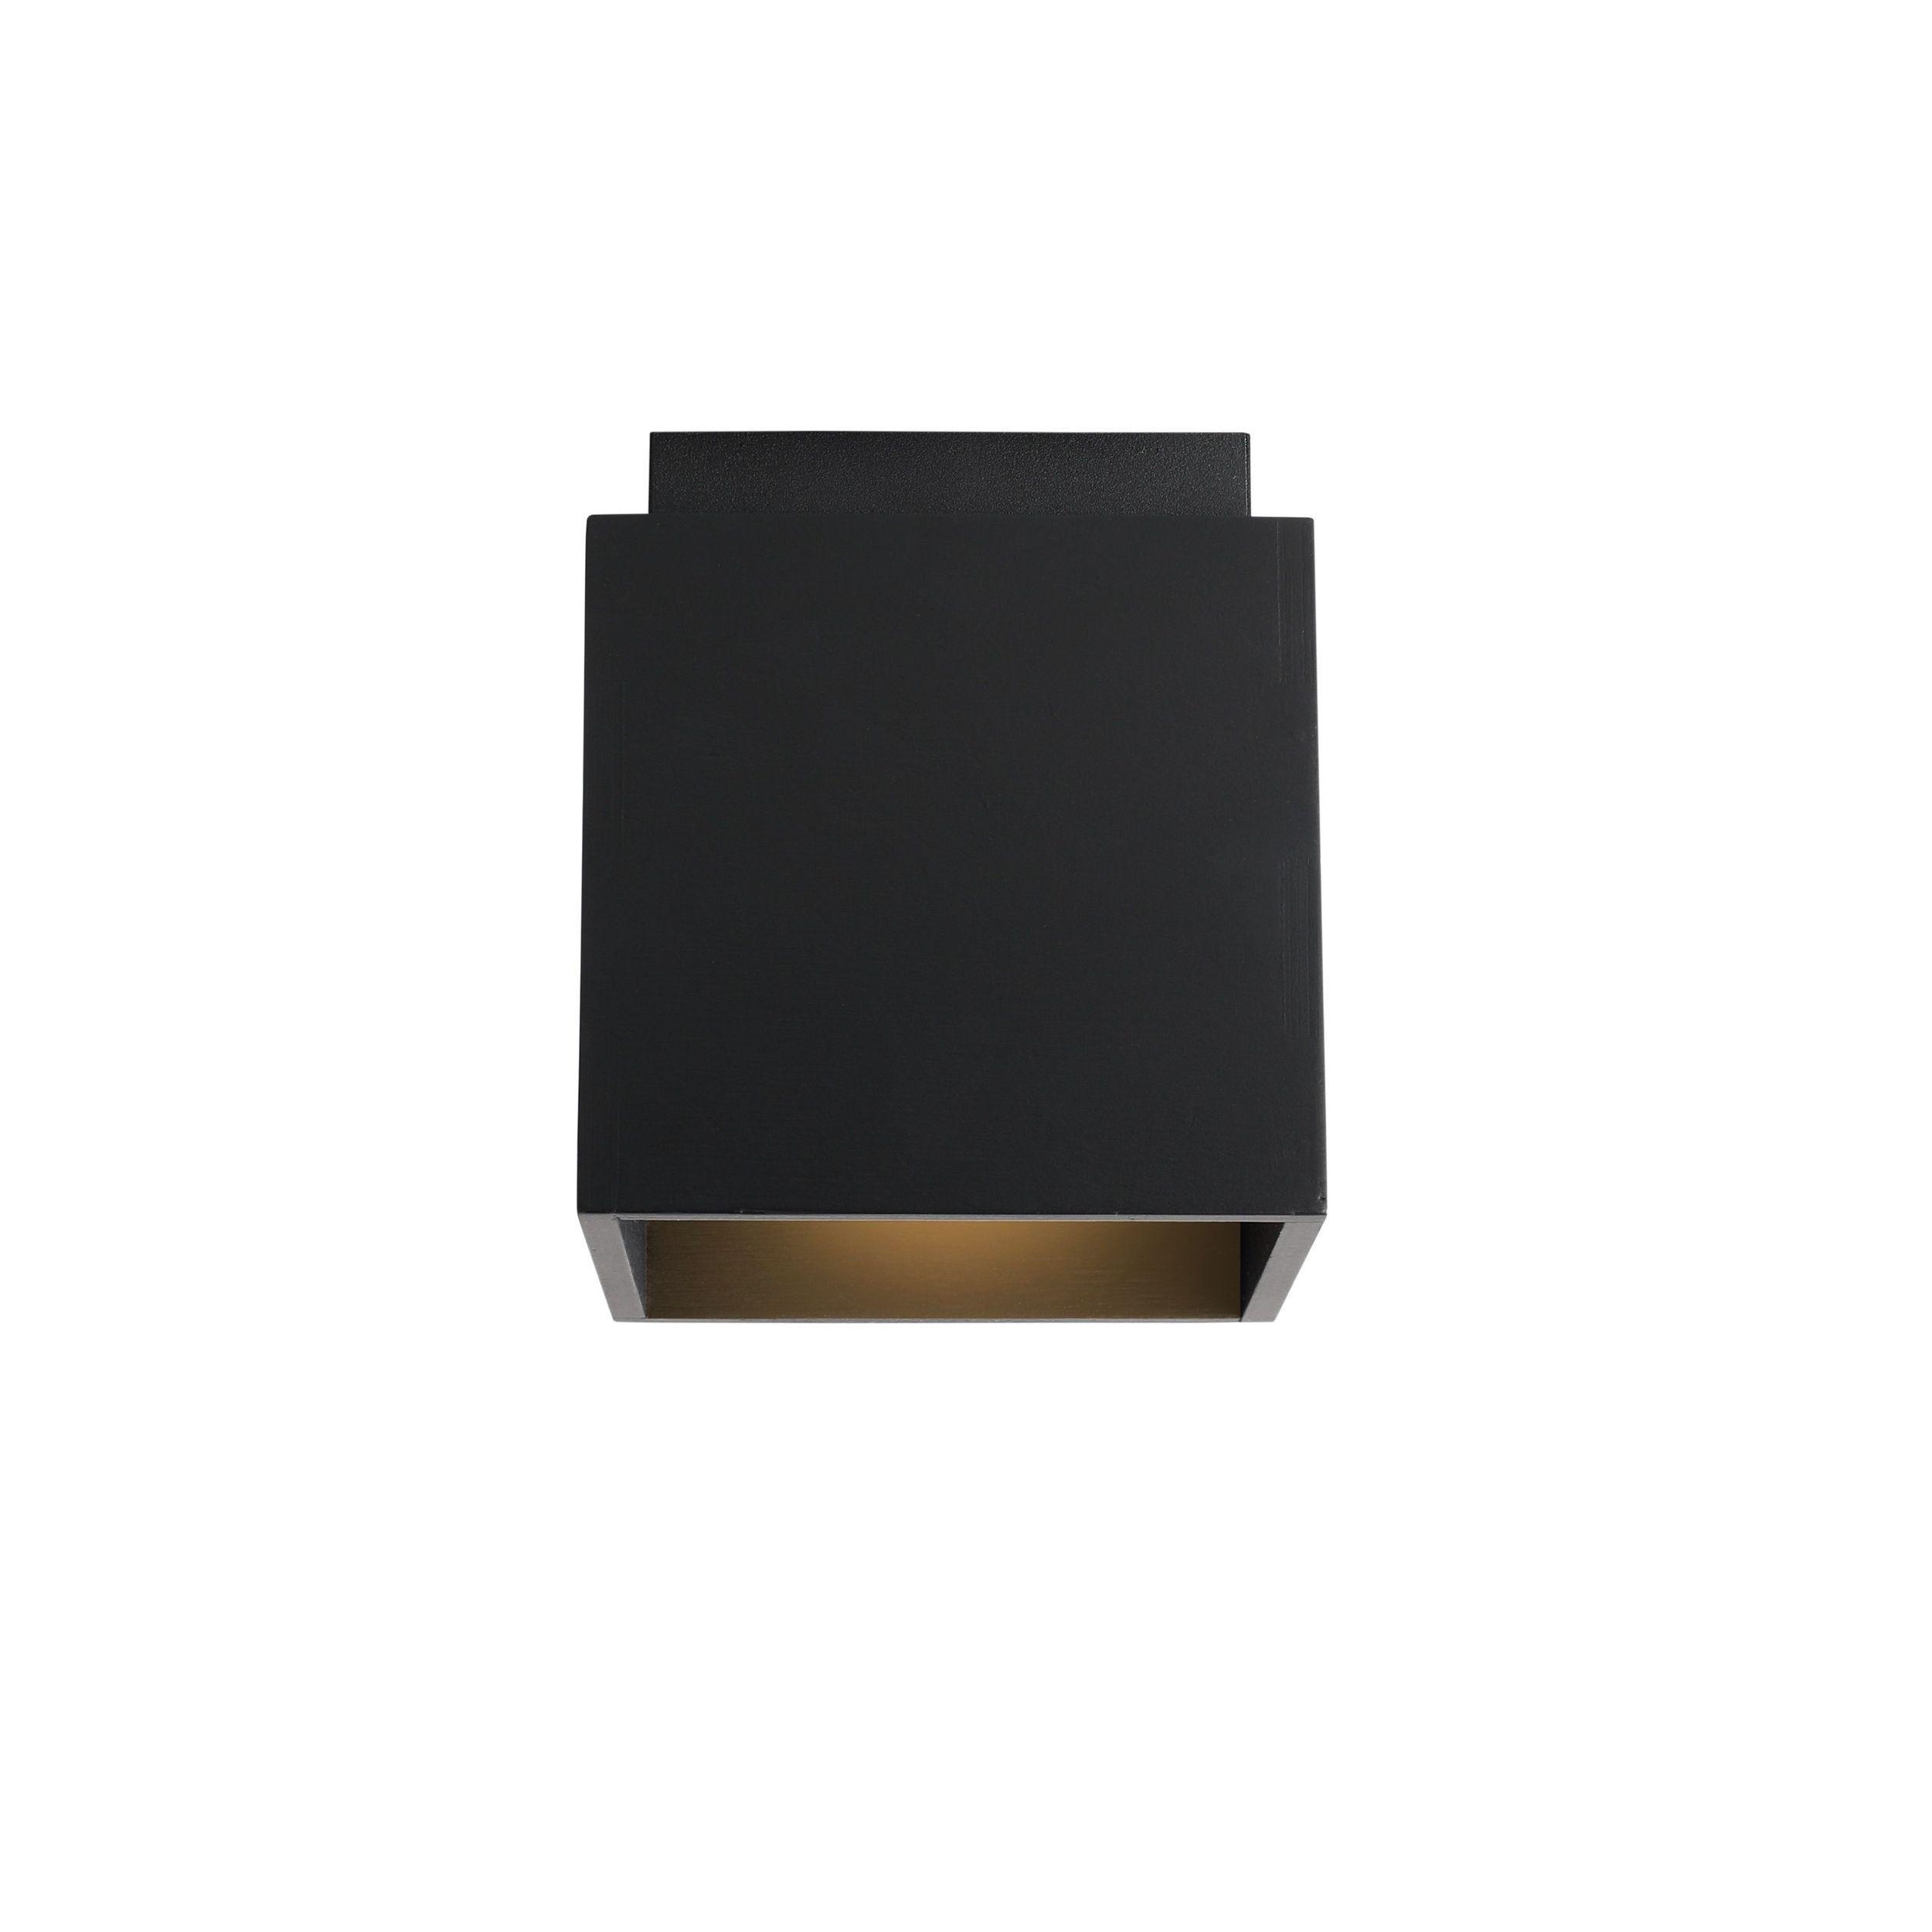 Plafon Aldex x1 Bit Black 982PL/G1